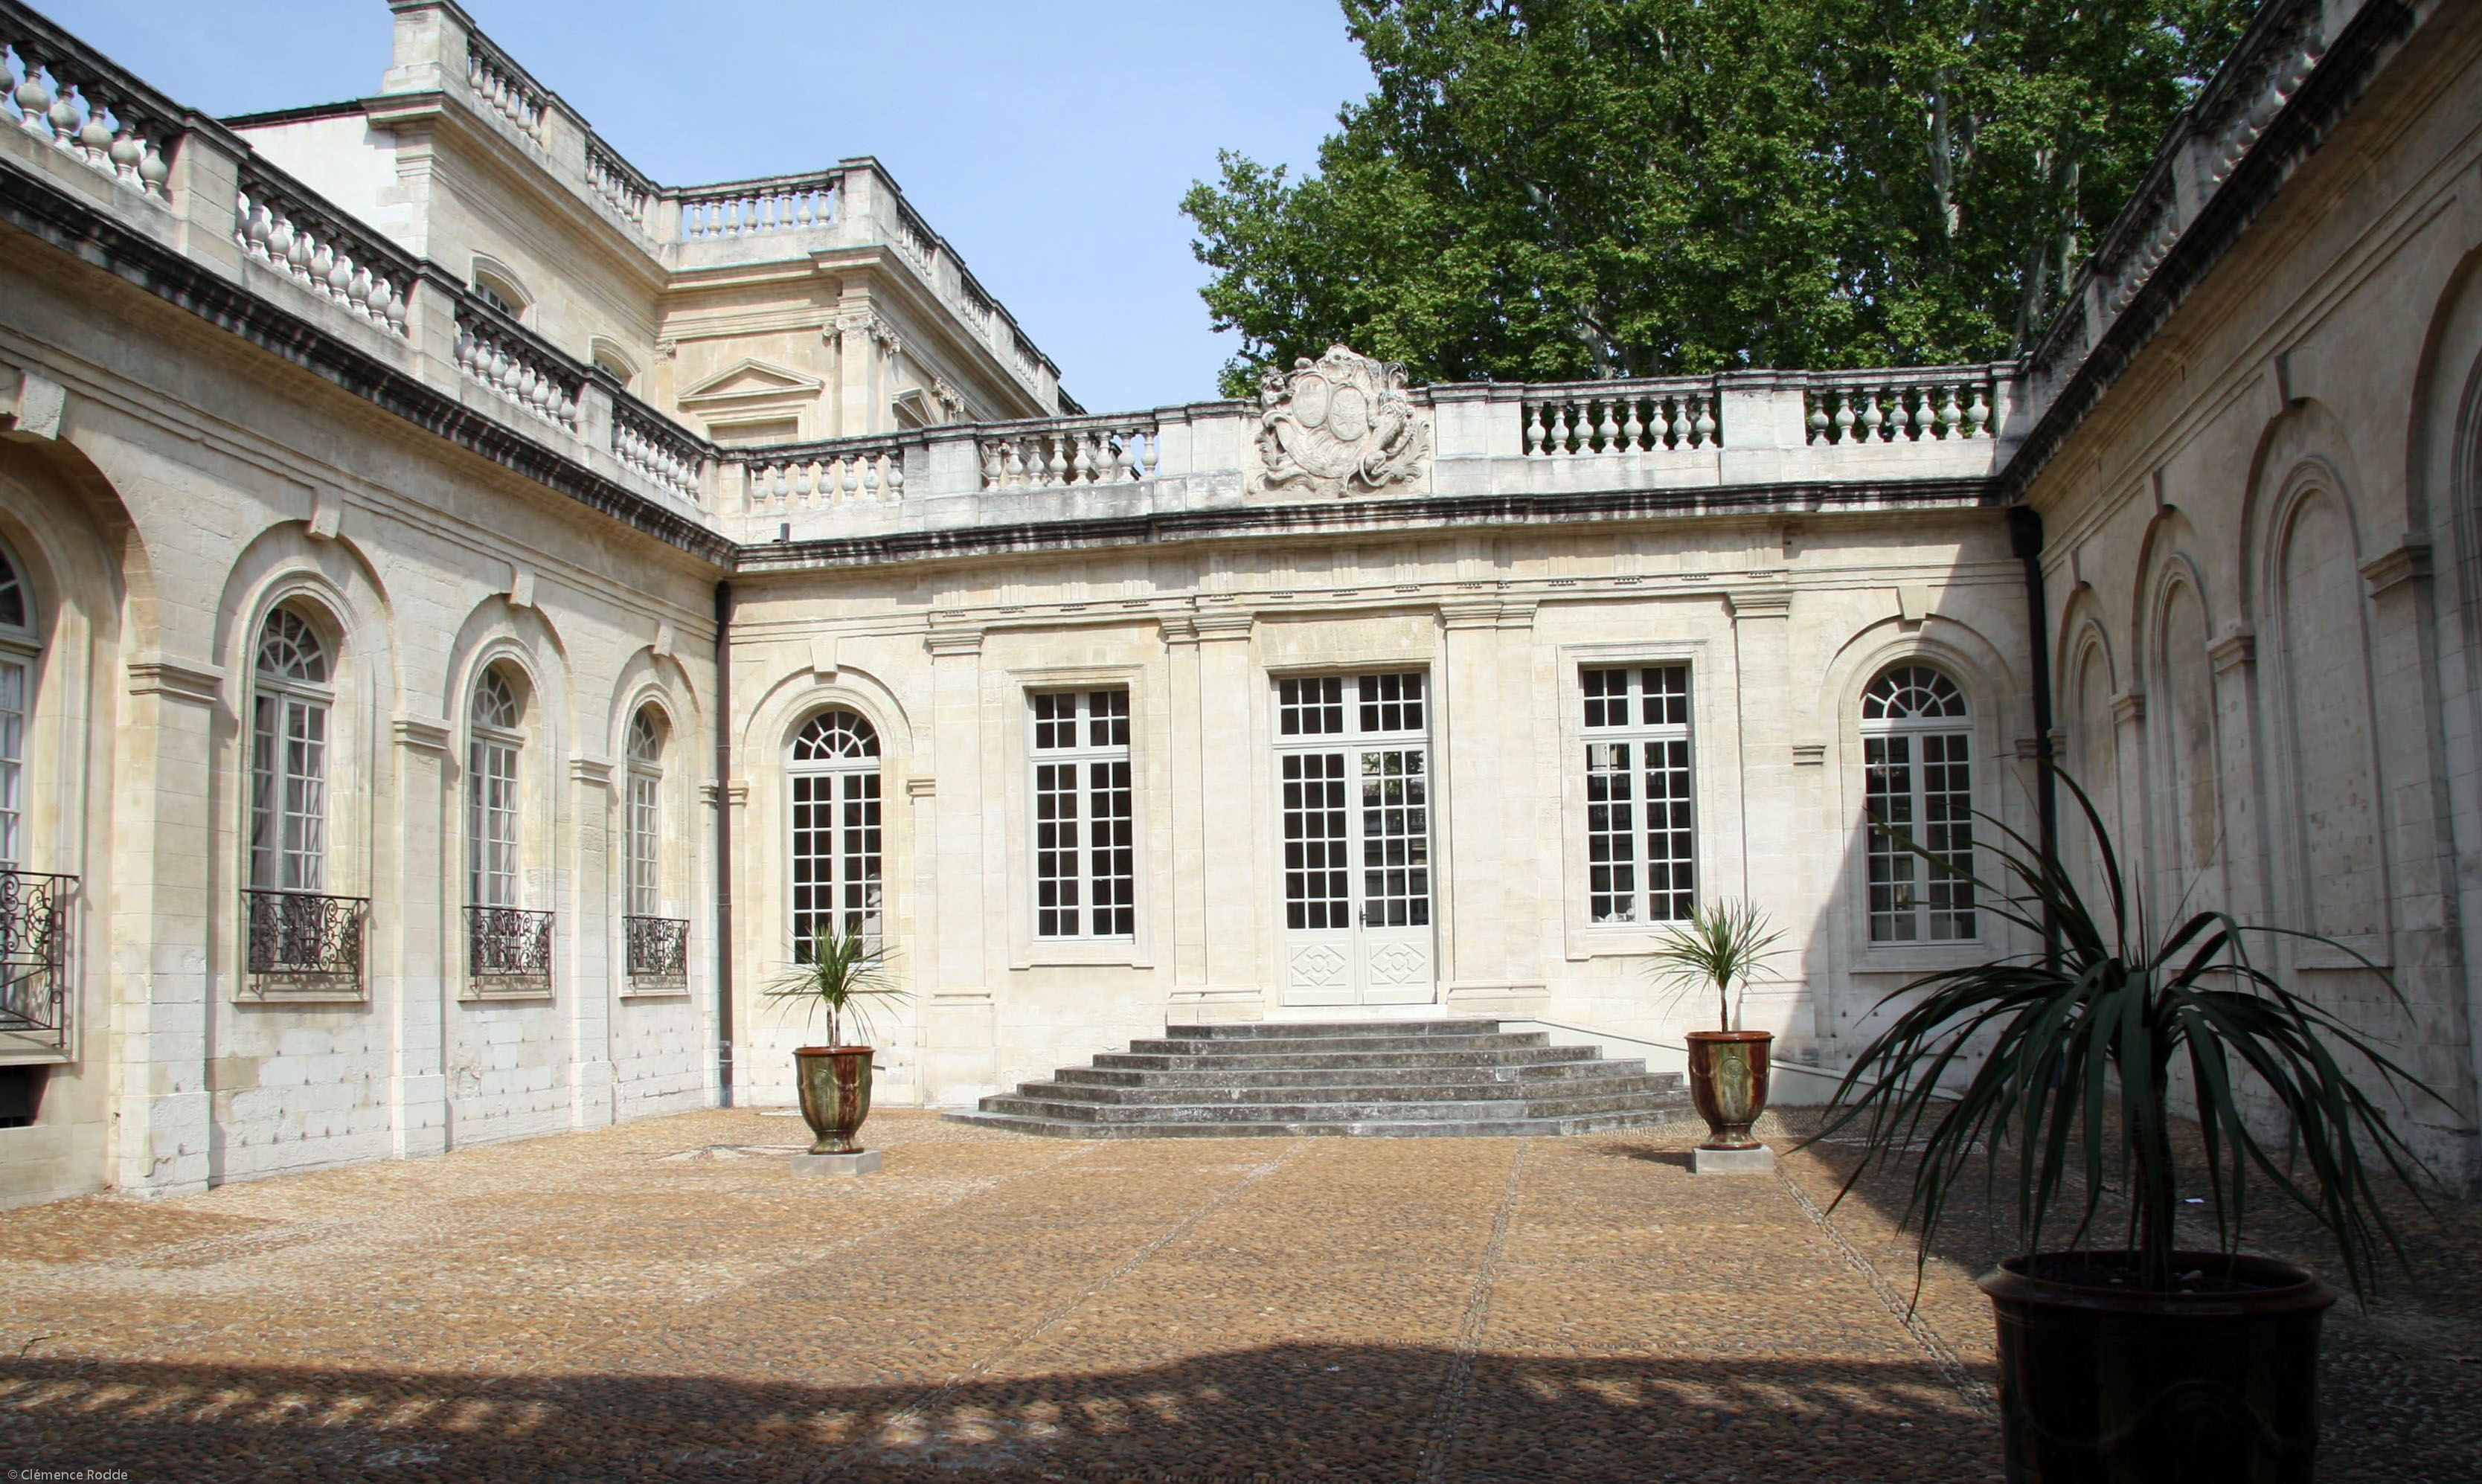 The courtyard of the Musée Calvet